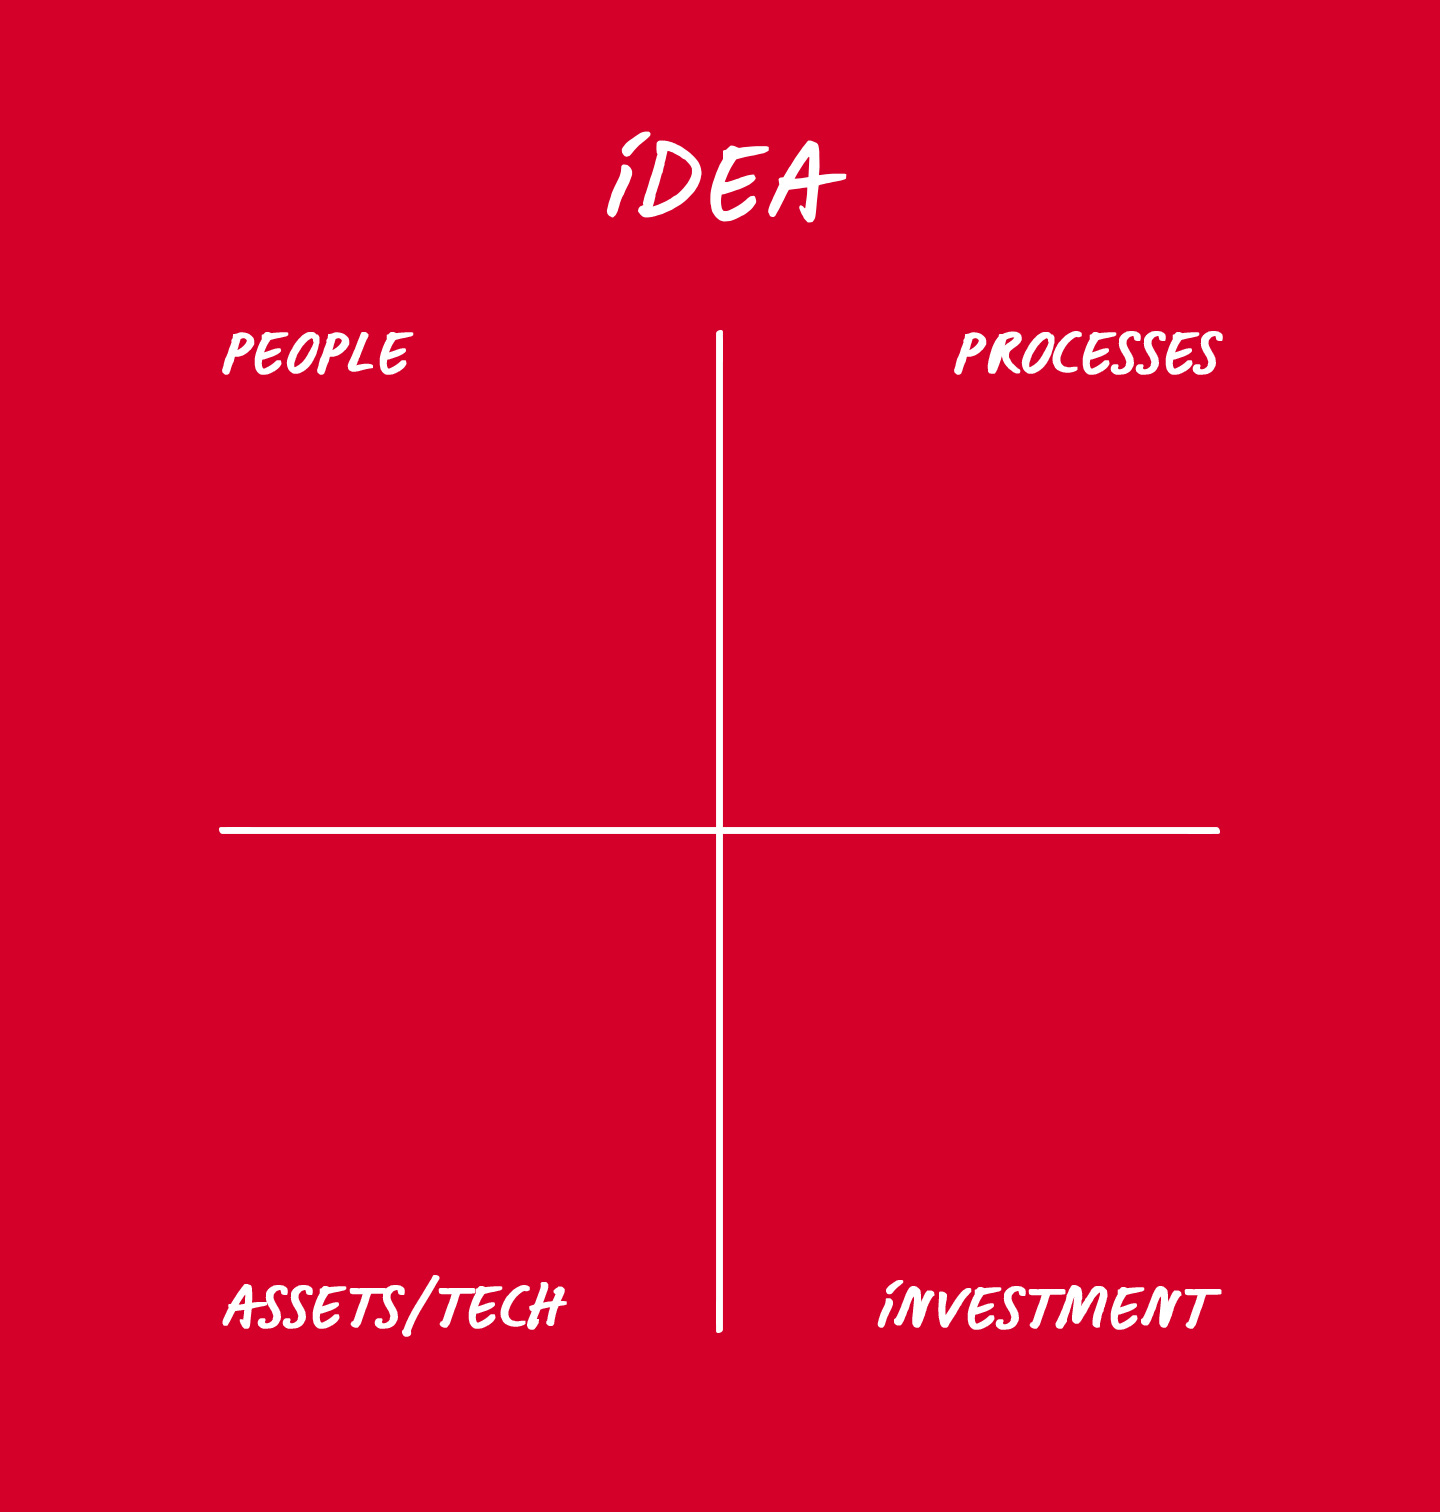 Generating new thinking